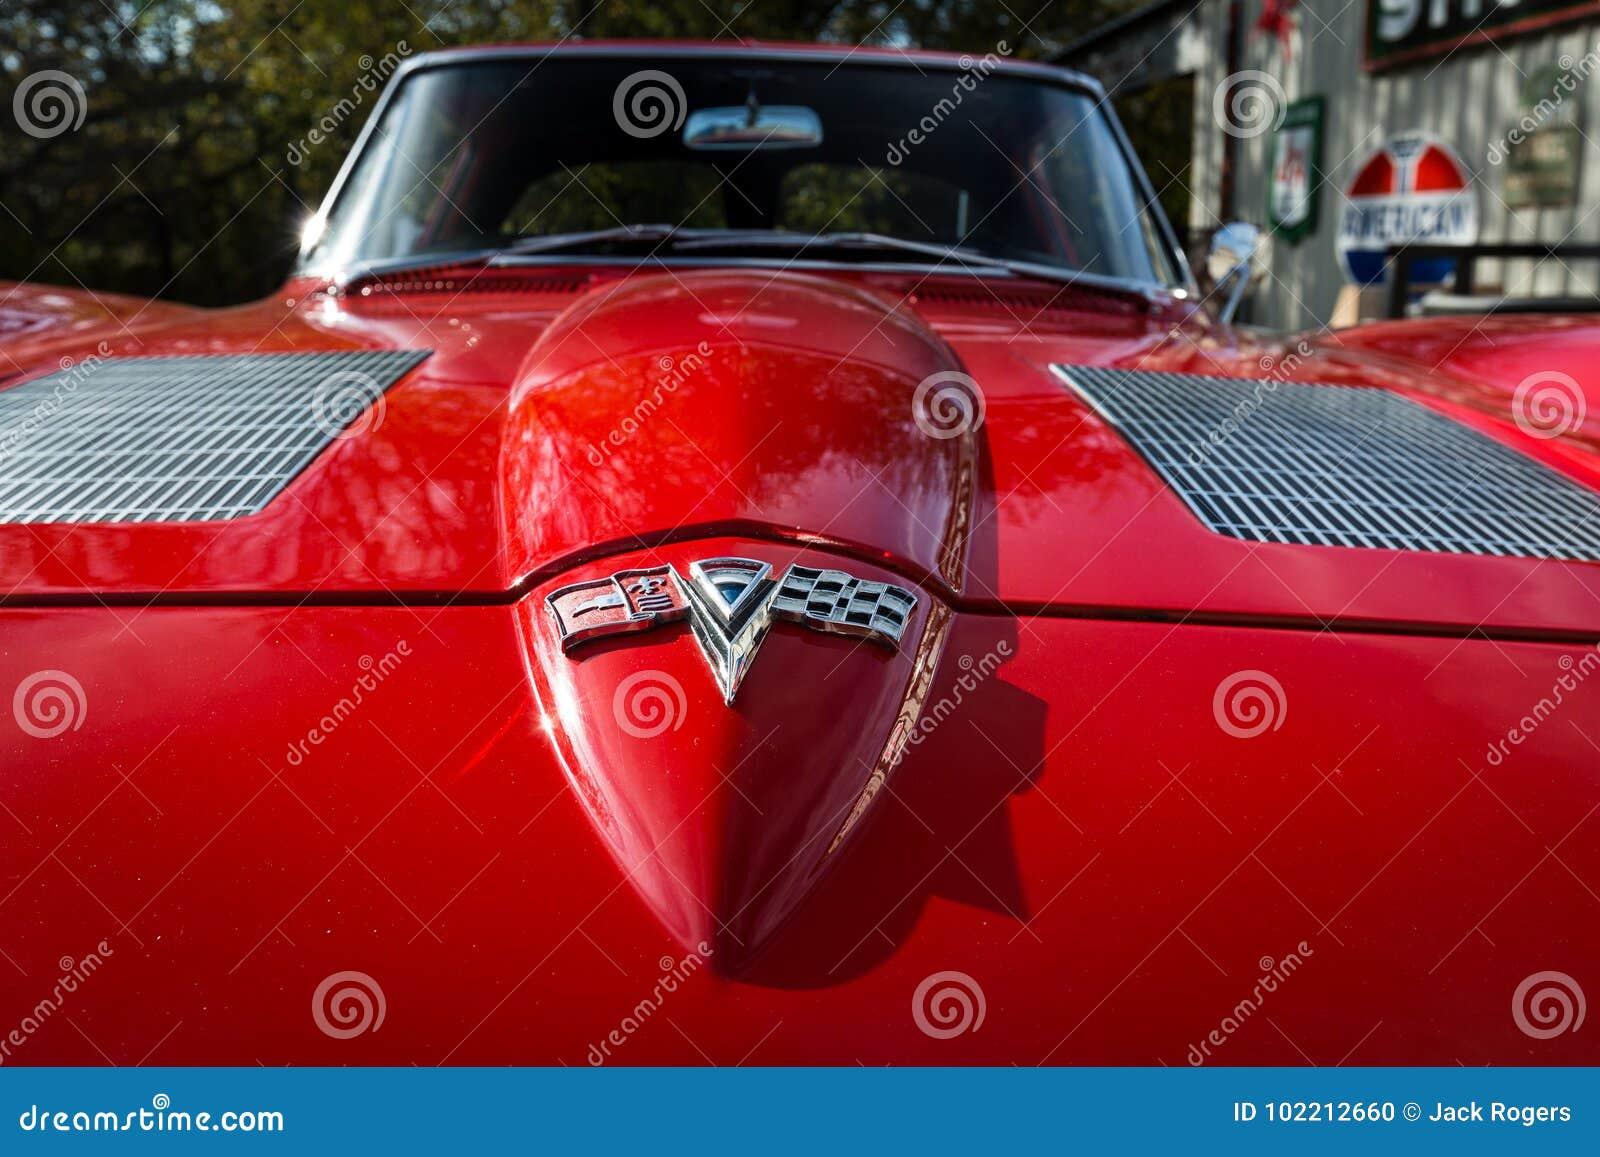 1963 Corvette Stingray editorial image  Image of race